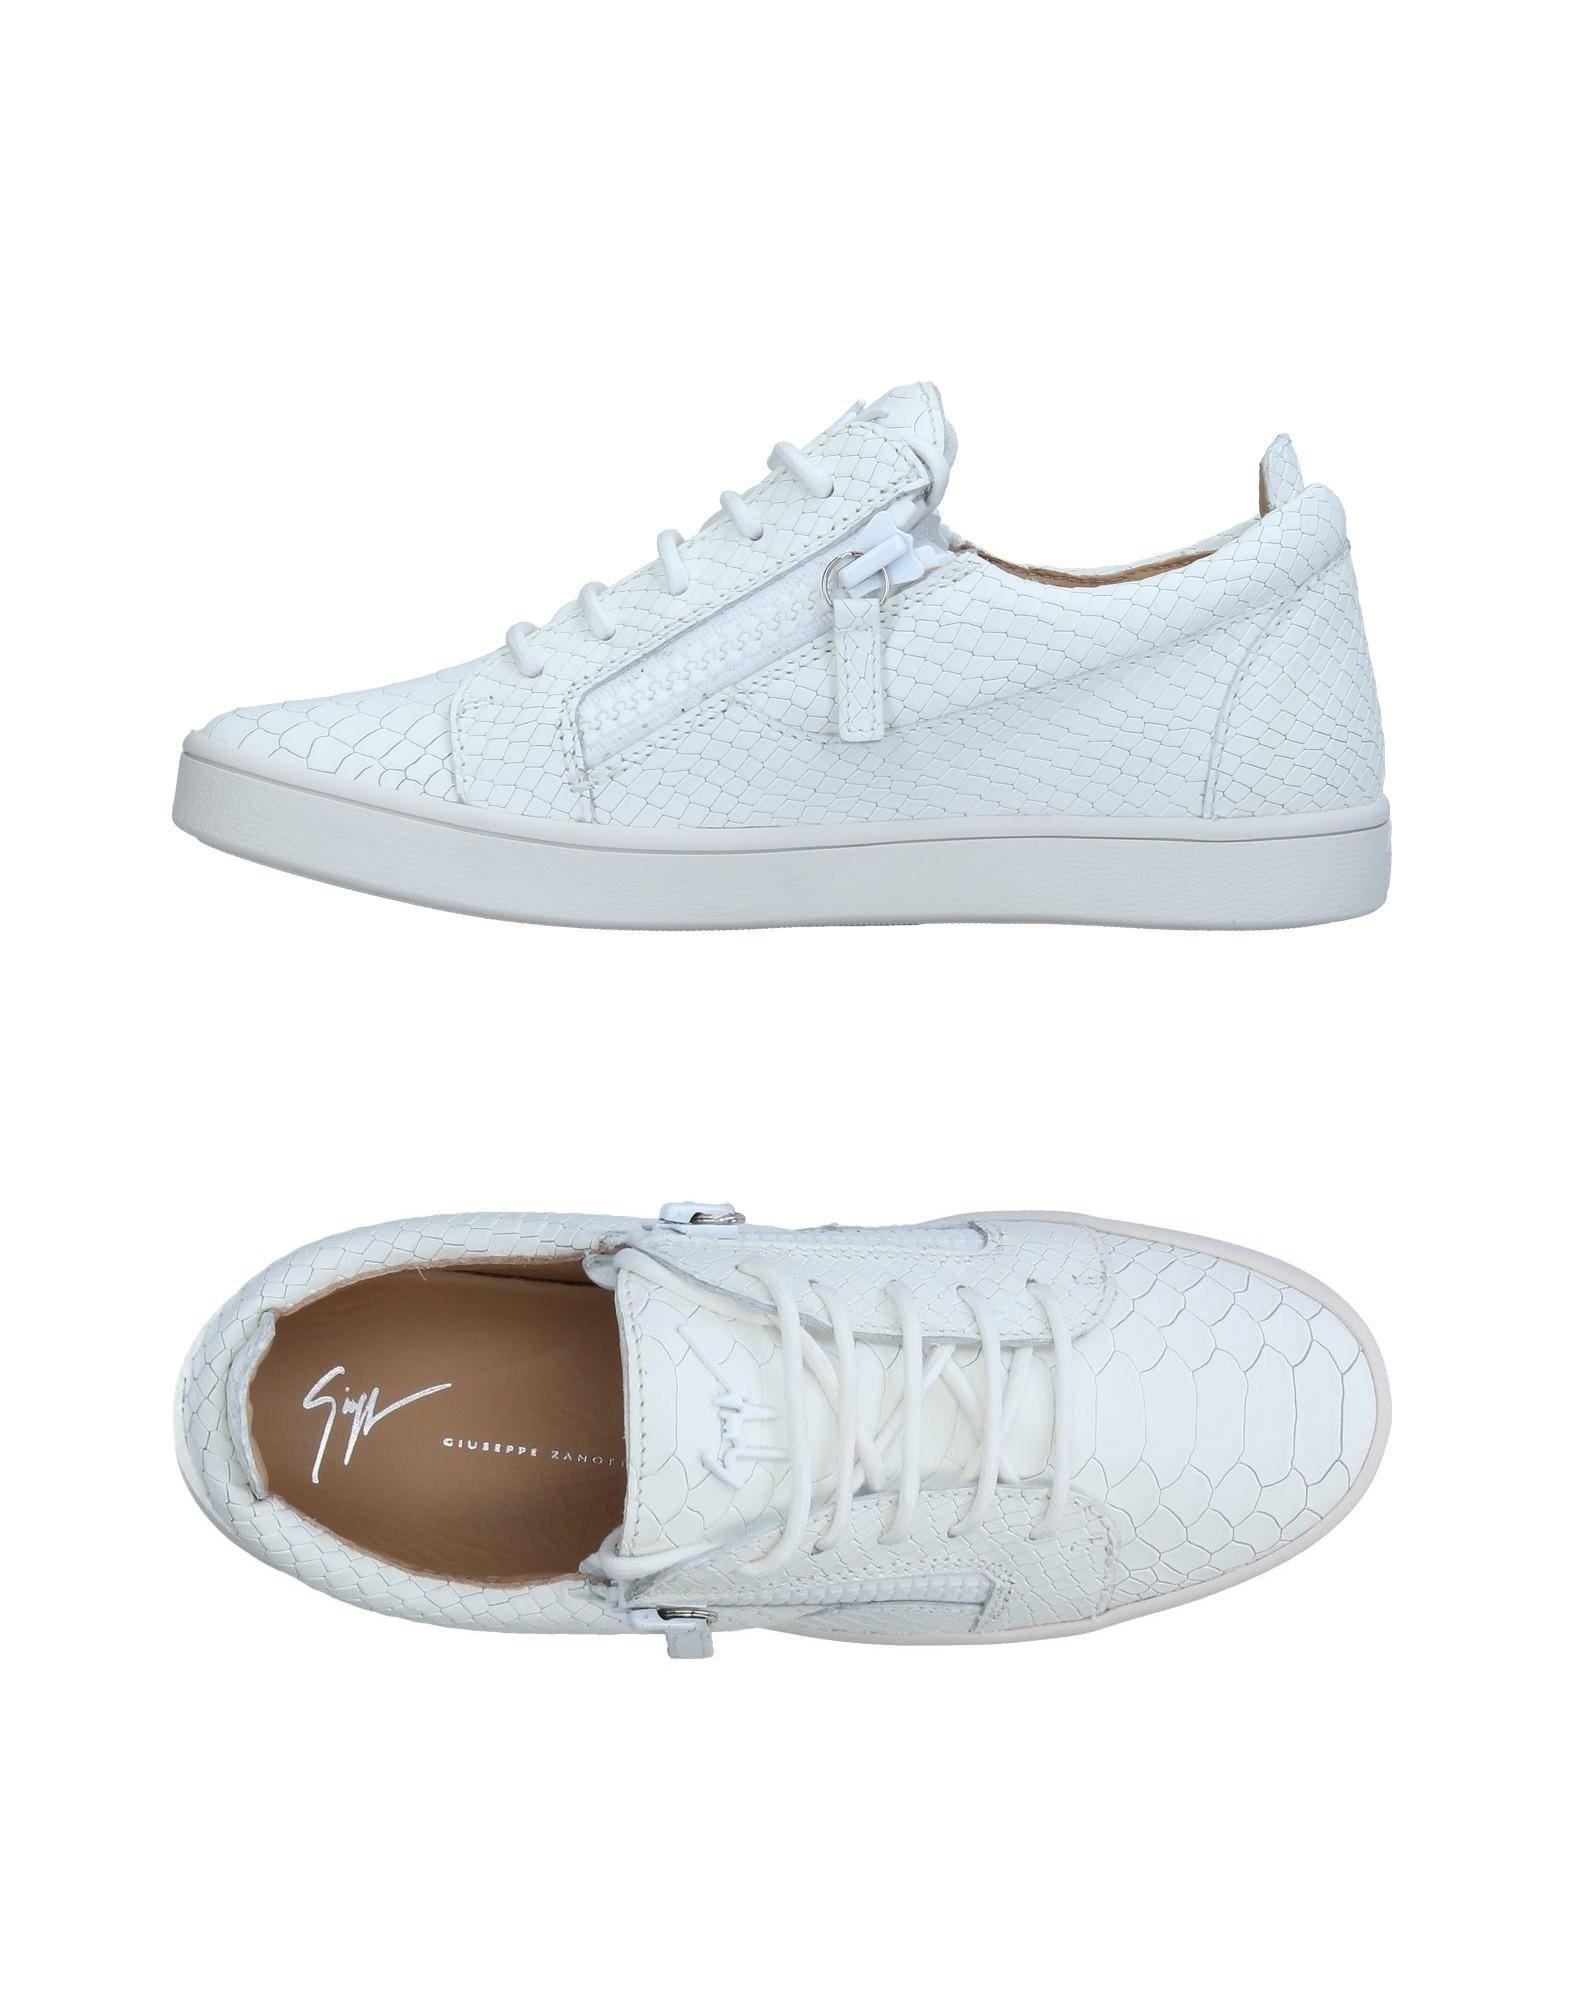 Giuseppe Zanotti Sneakers - Women Giuseppe Zanotti Sneakers online 11356256VT on  Canada - 11356256VT online bf1b35